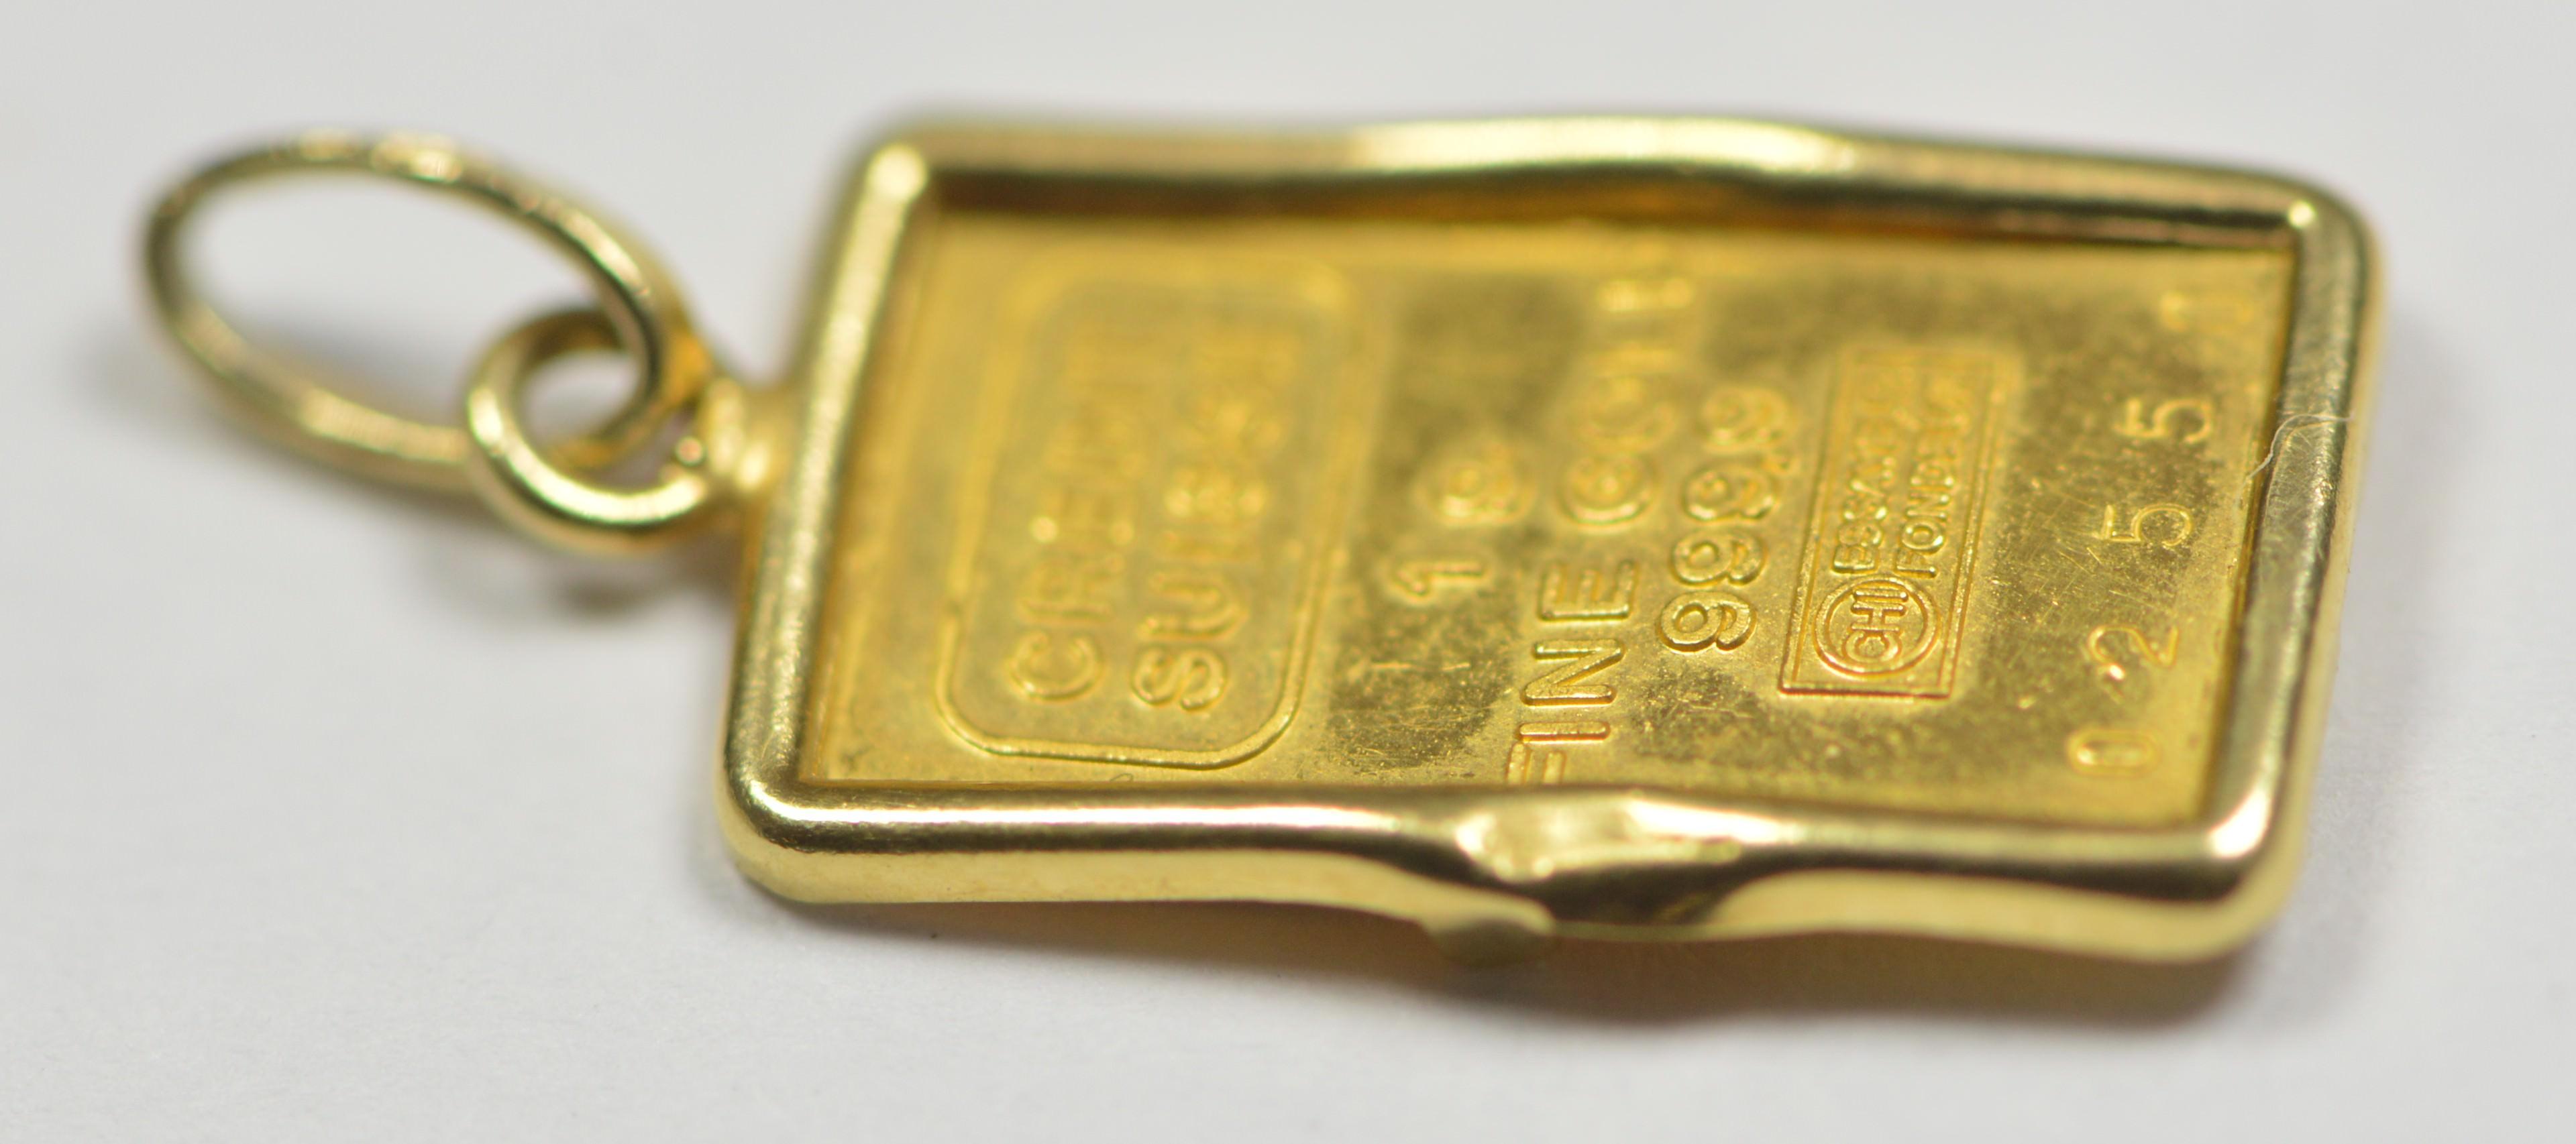 1 gram gold bar in bezel property room 1 gram gold bar in bezel aloadofball Images